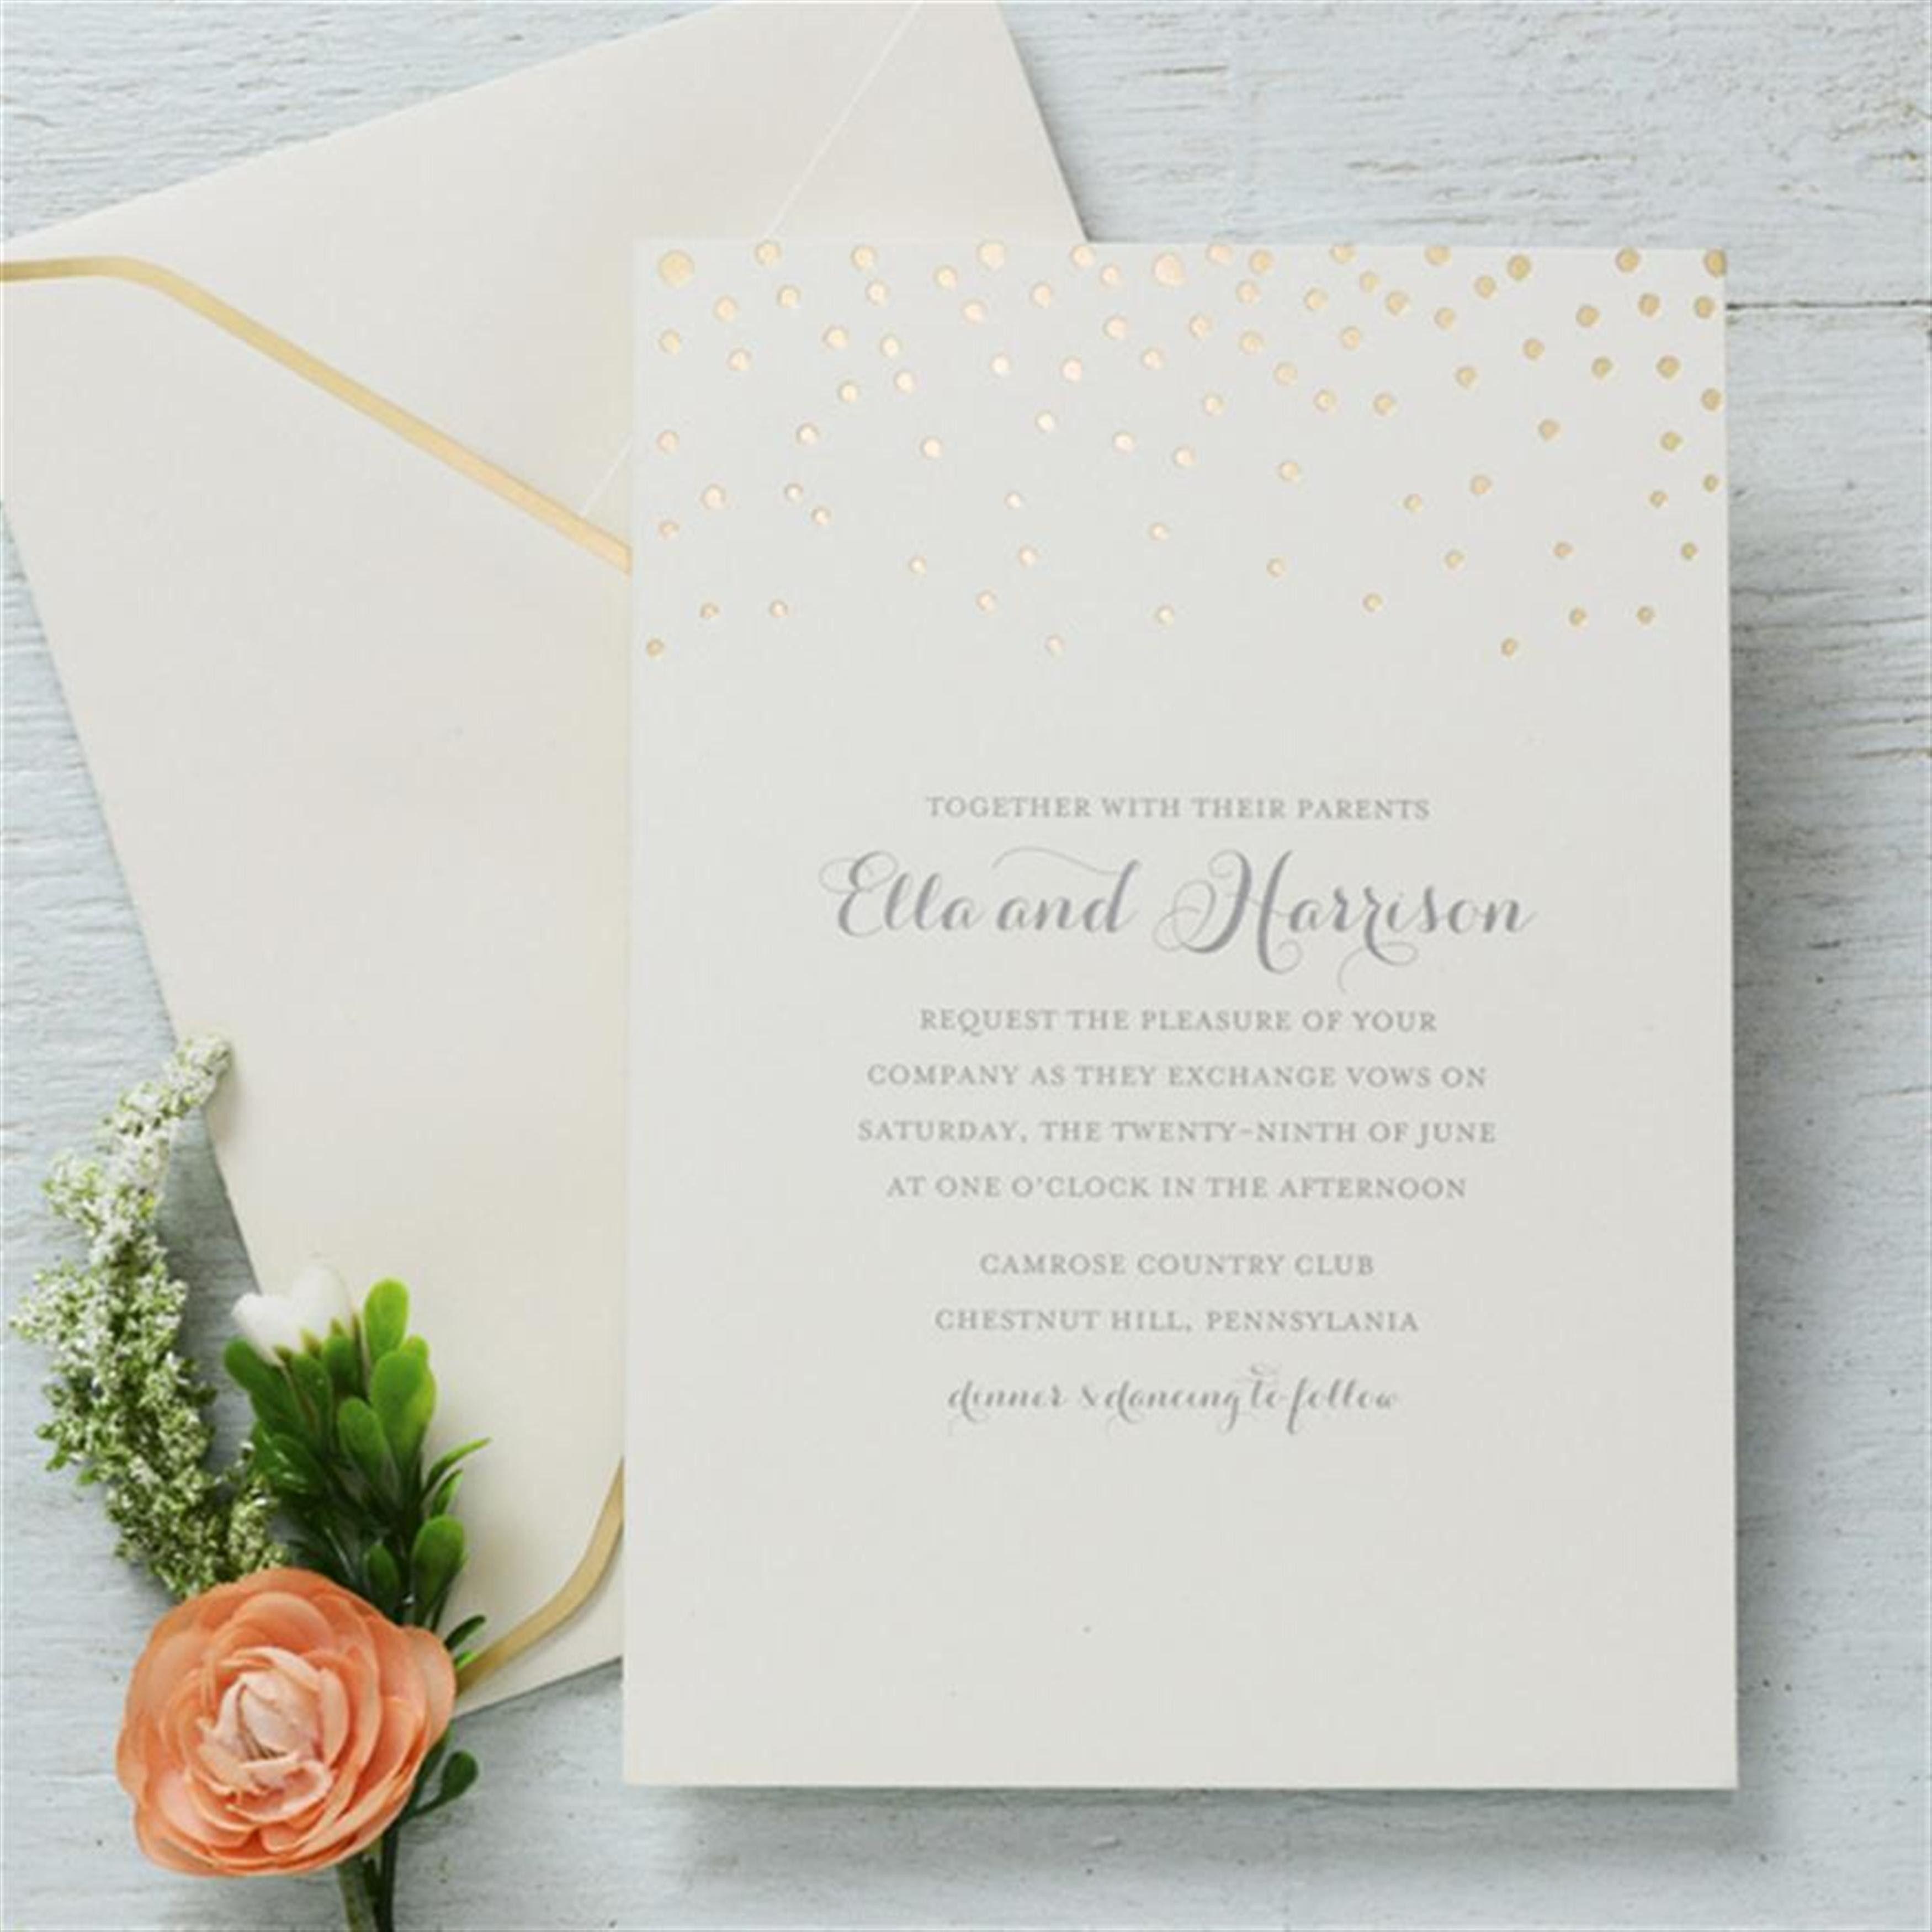 Gold Foil Dots Wedding Invitation Kit